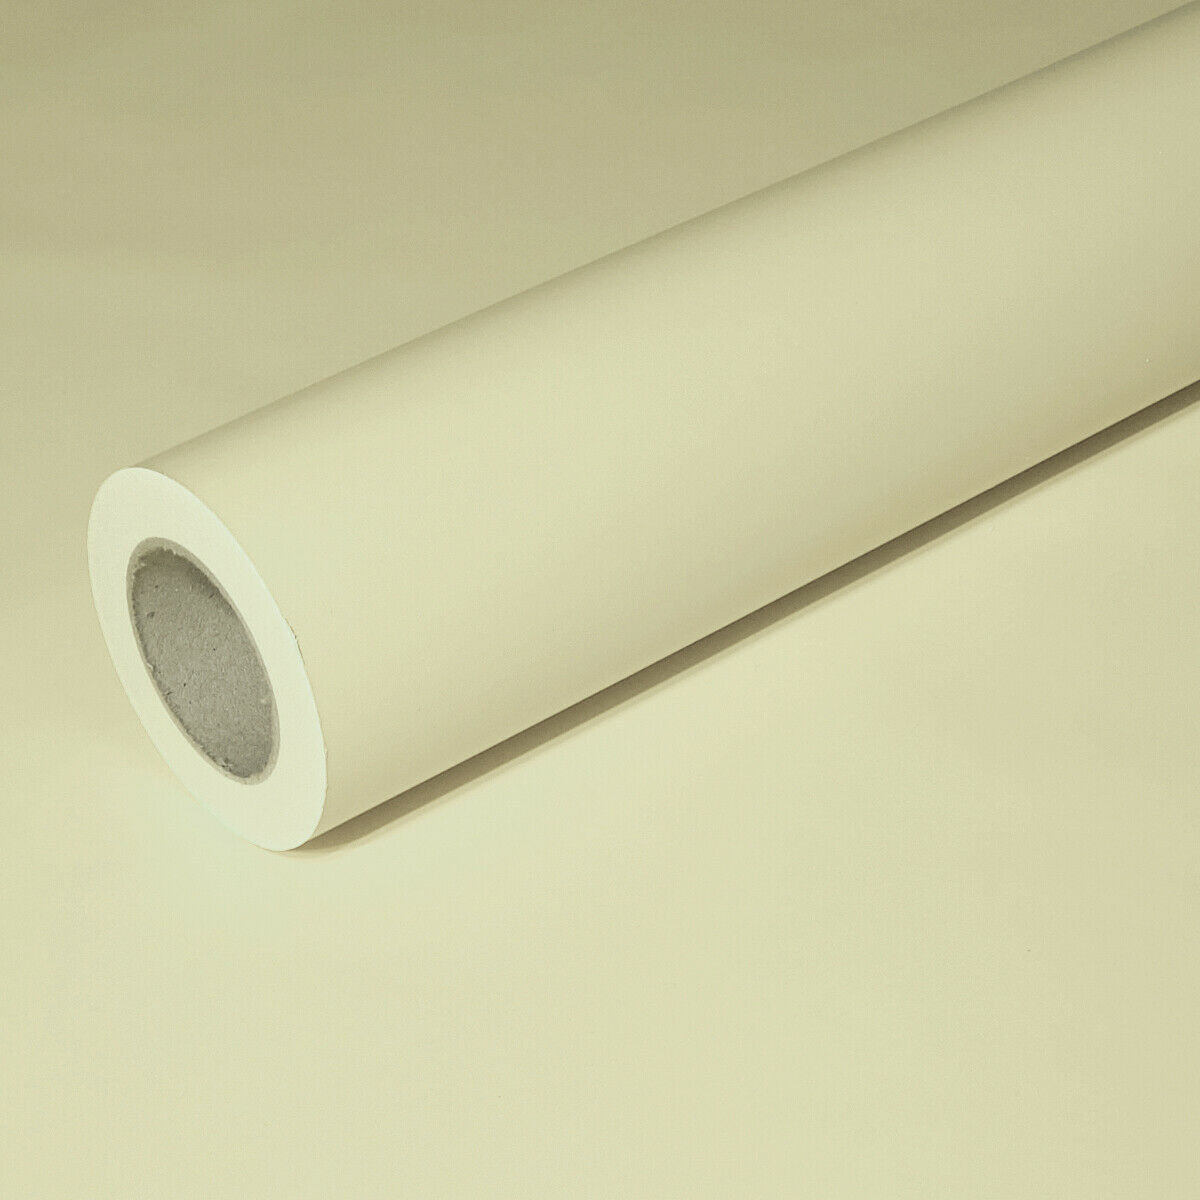 0,47 /m² 50m x 1,00m champán-beige junopax regalo de papel resistente a la intemperie mojado fijo